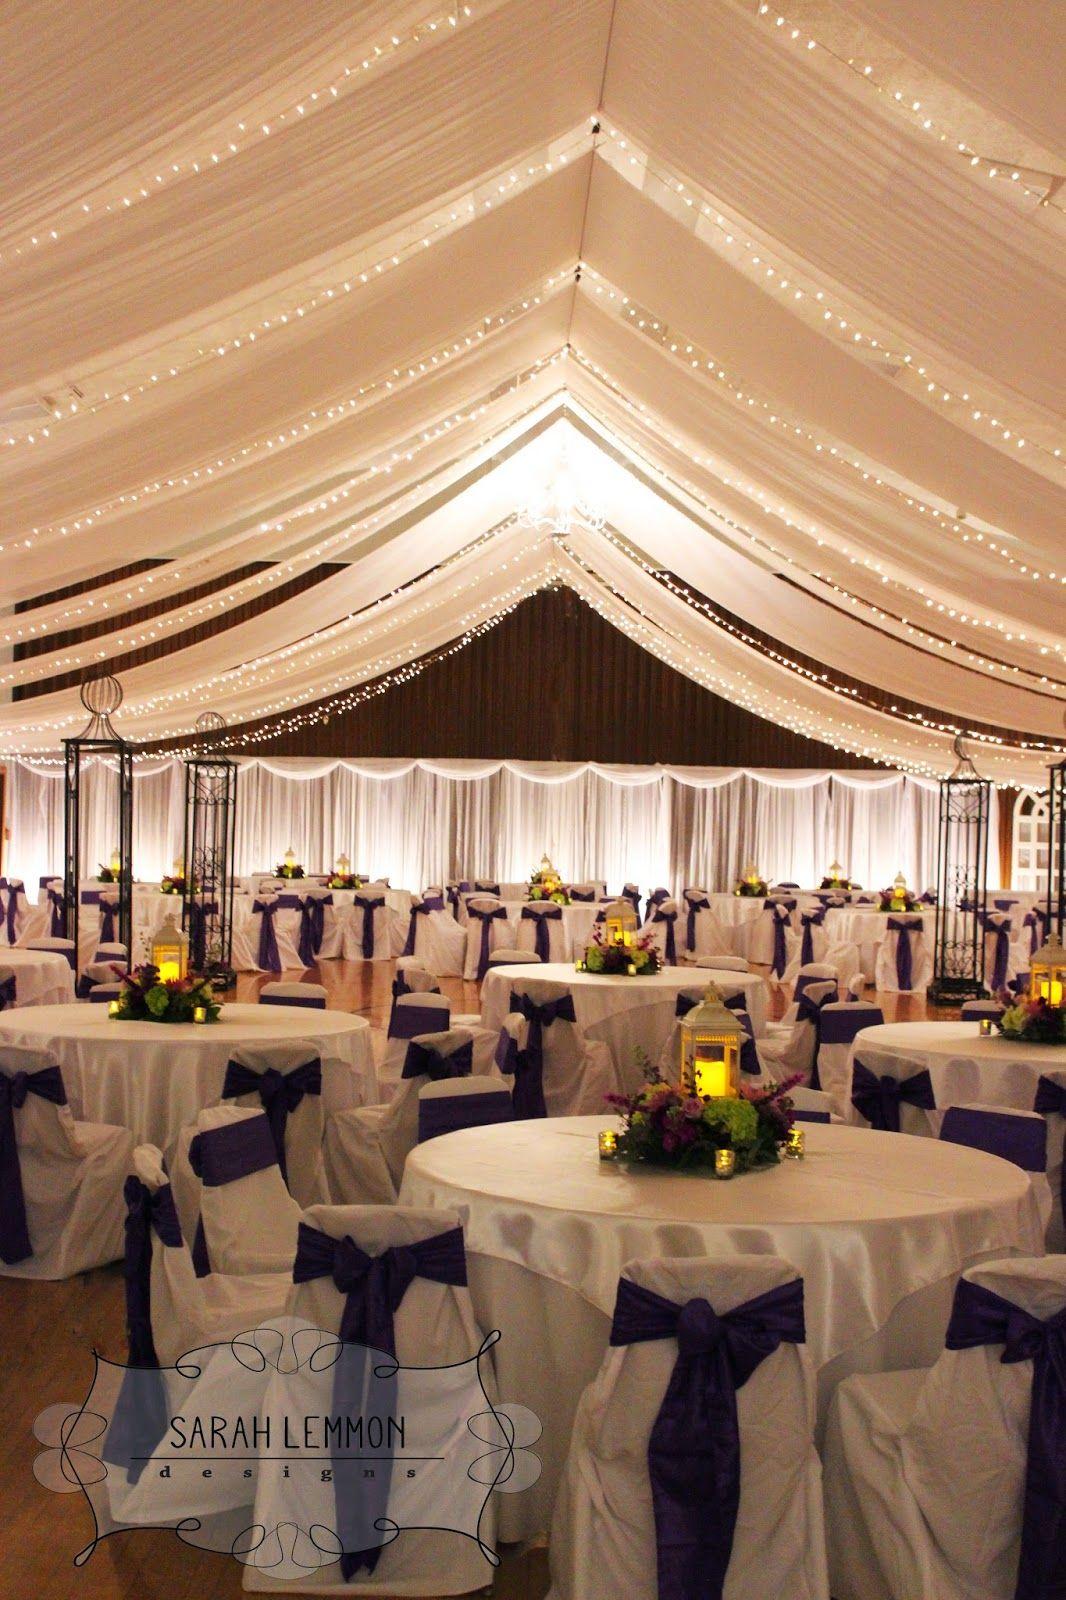 Sarah Lemmon Designs Purple Celadon Wedding Reception Wedding Tent Decorations Wedding Reception Hall Reception Ceiling